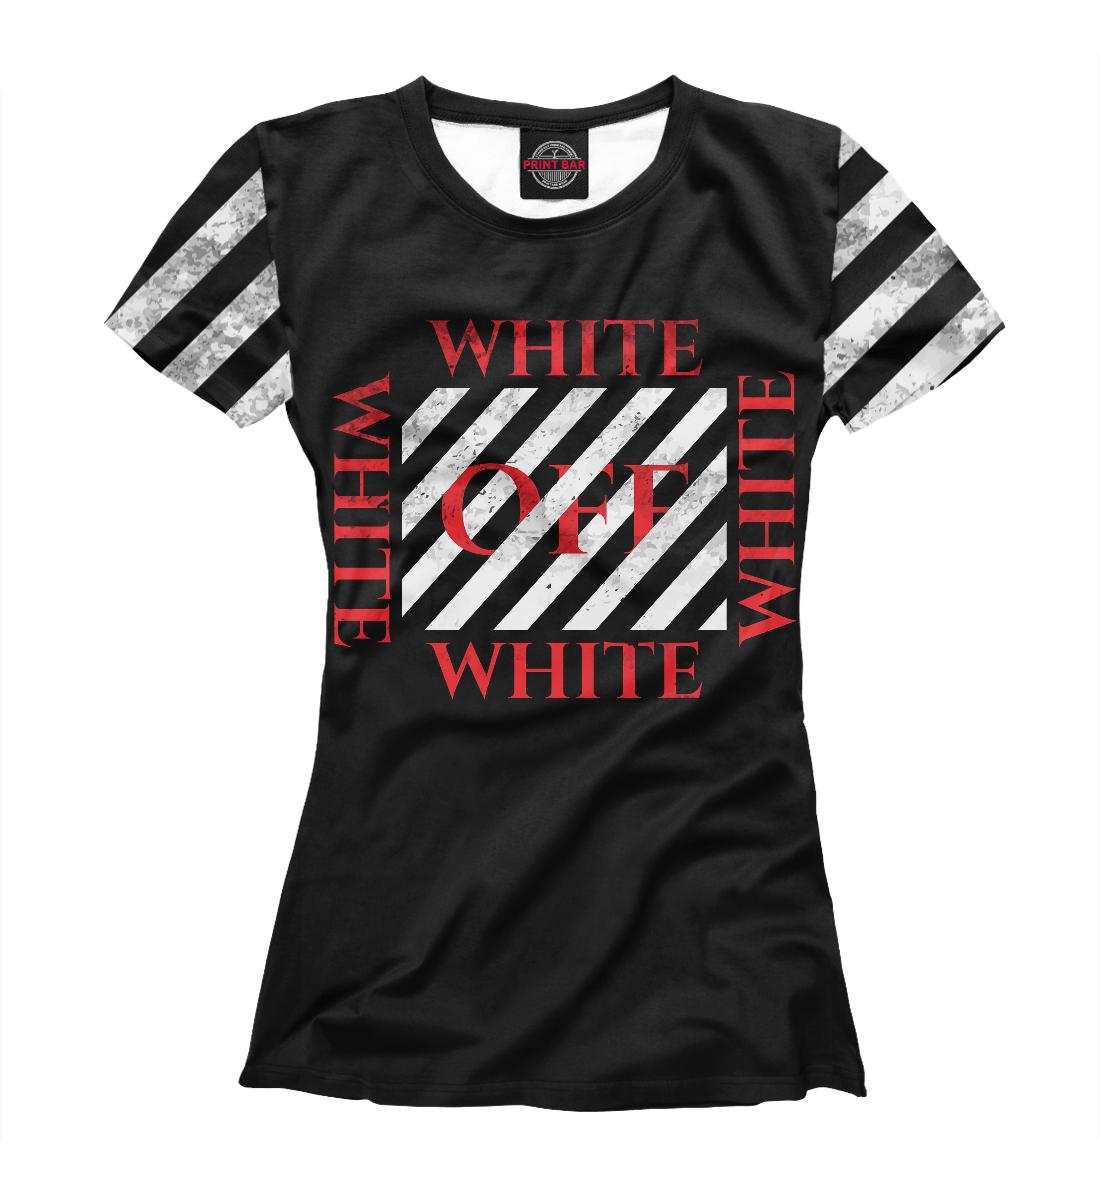 Купить Off-White GG Style, Printbar, Футболки, APD-461144-fut-1